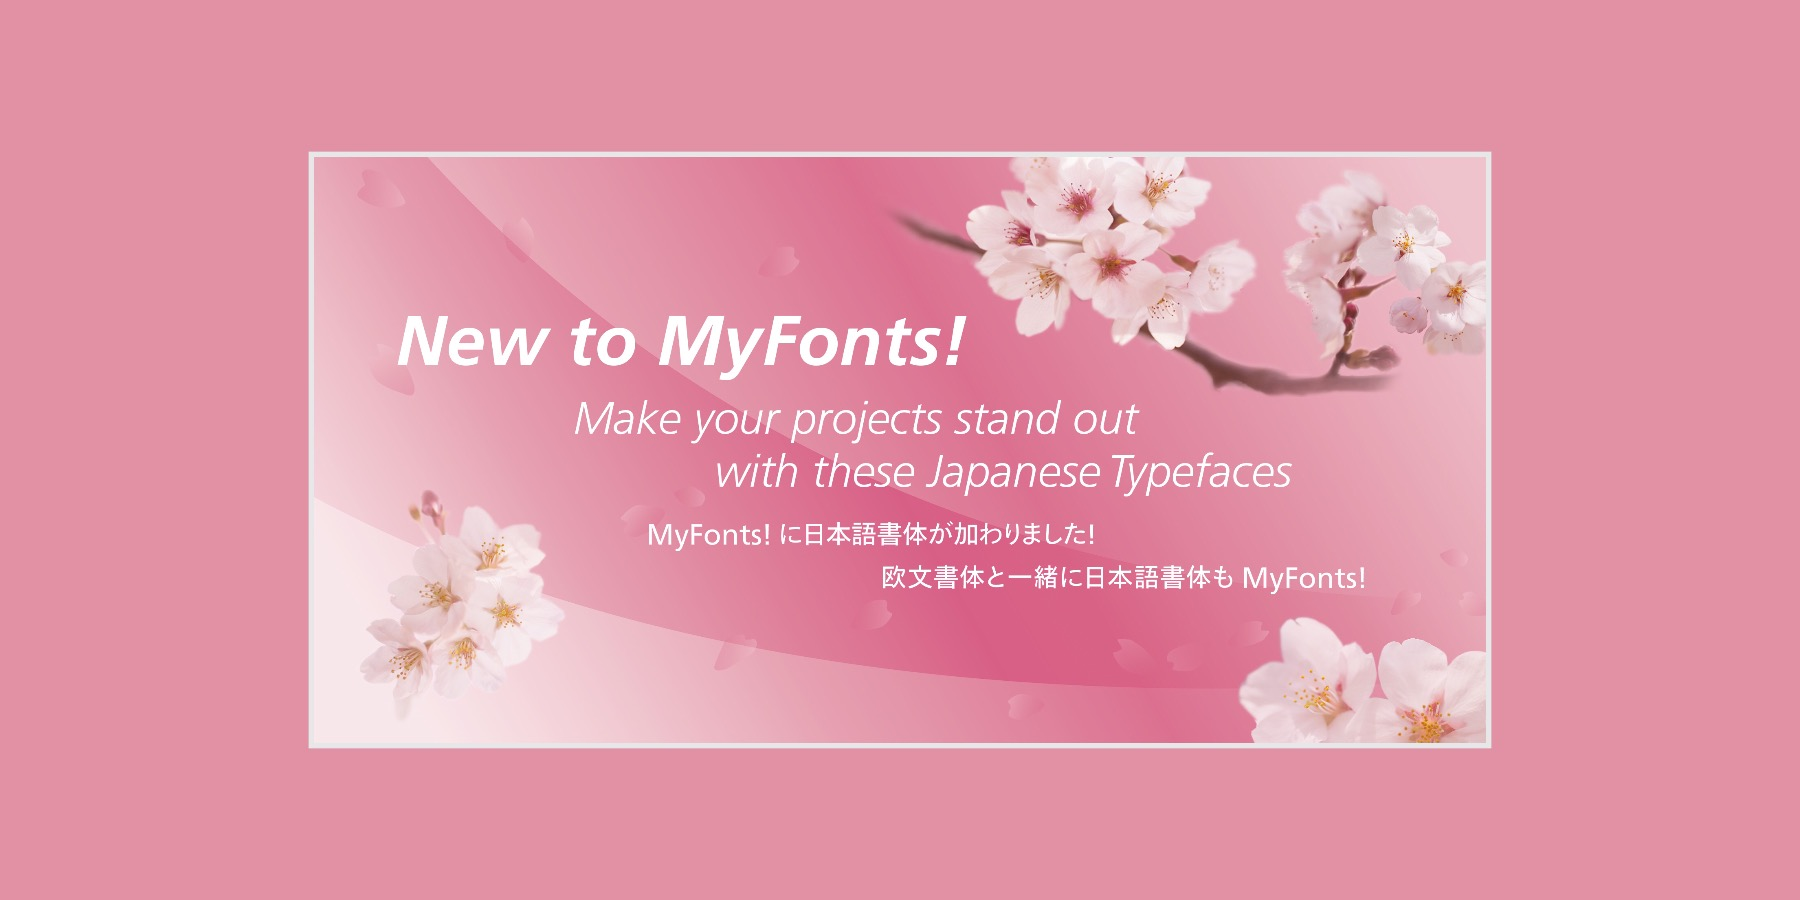 Japanese Typefaces